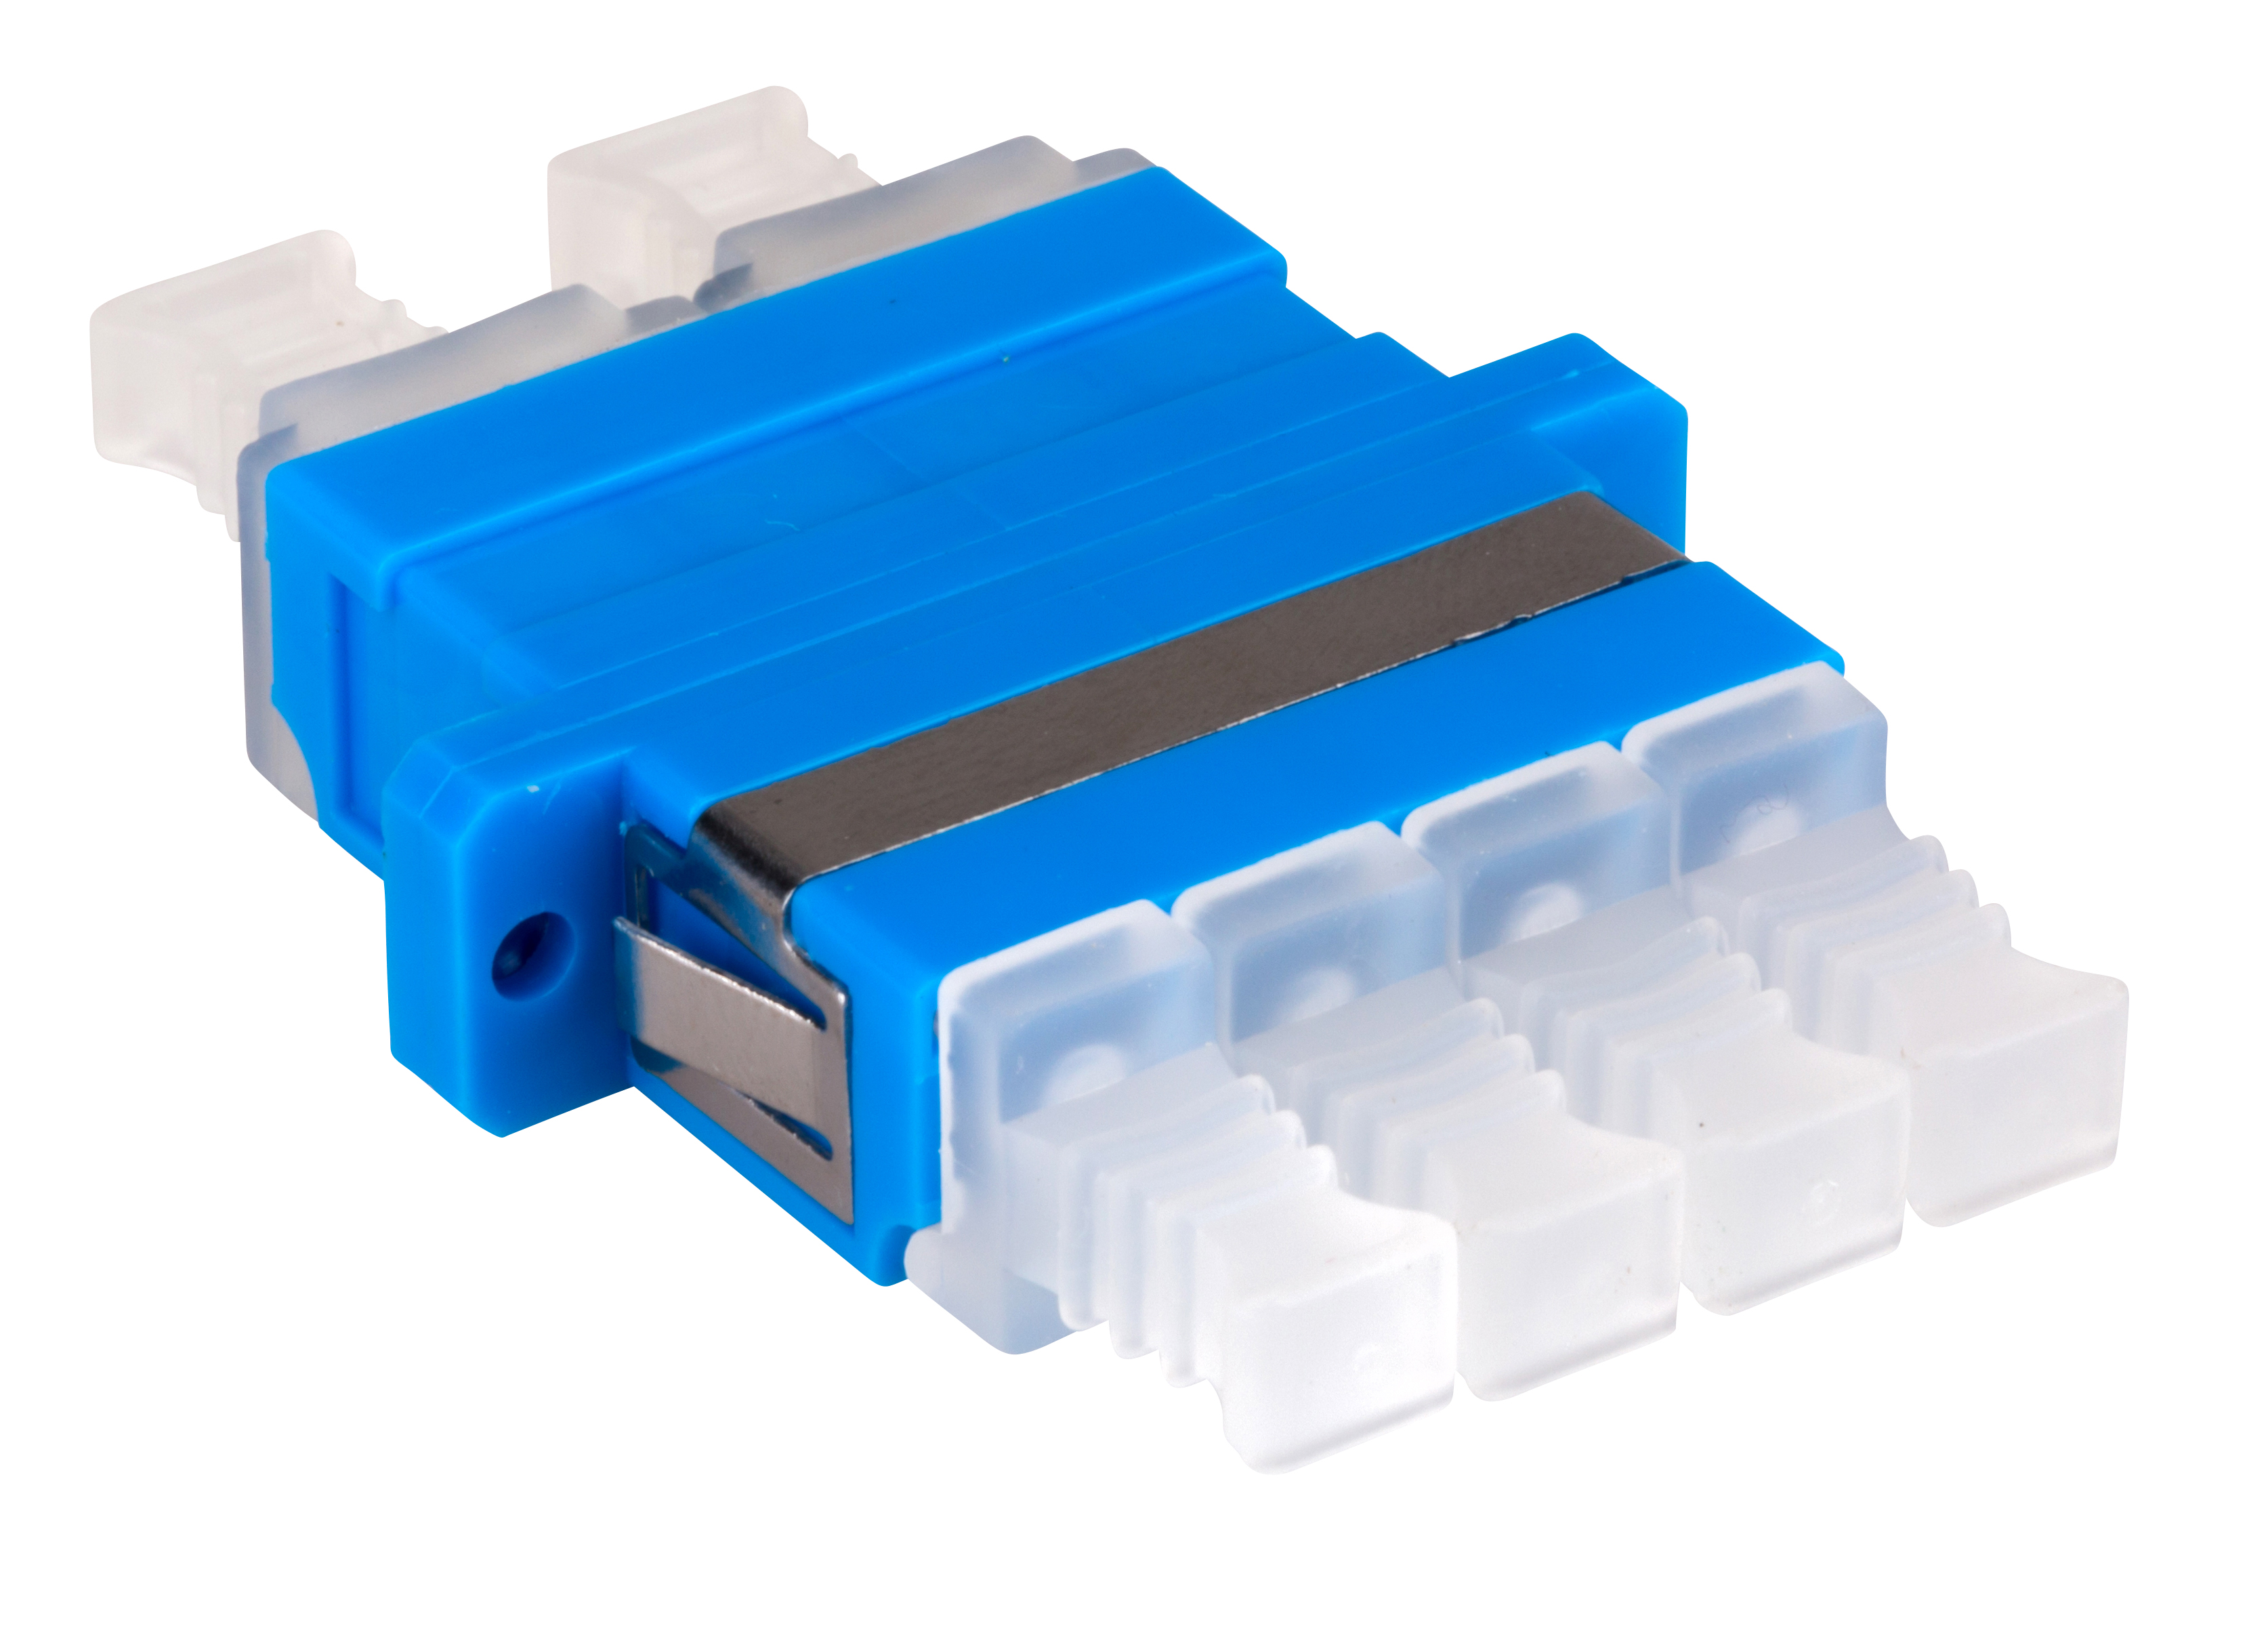 1 Stk LWL Kupplung LC-Quad, Singlemode zirconia, Flansch, blau HMOL000106